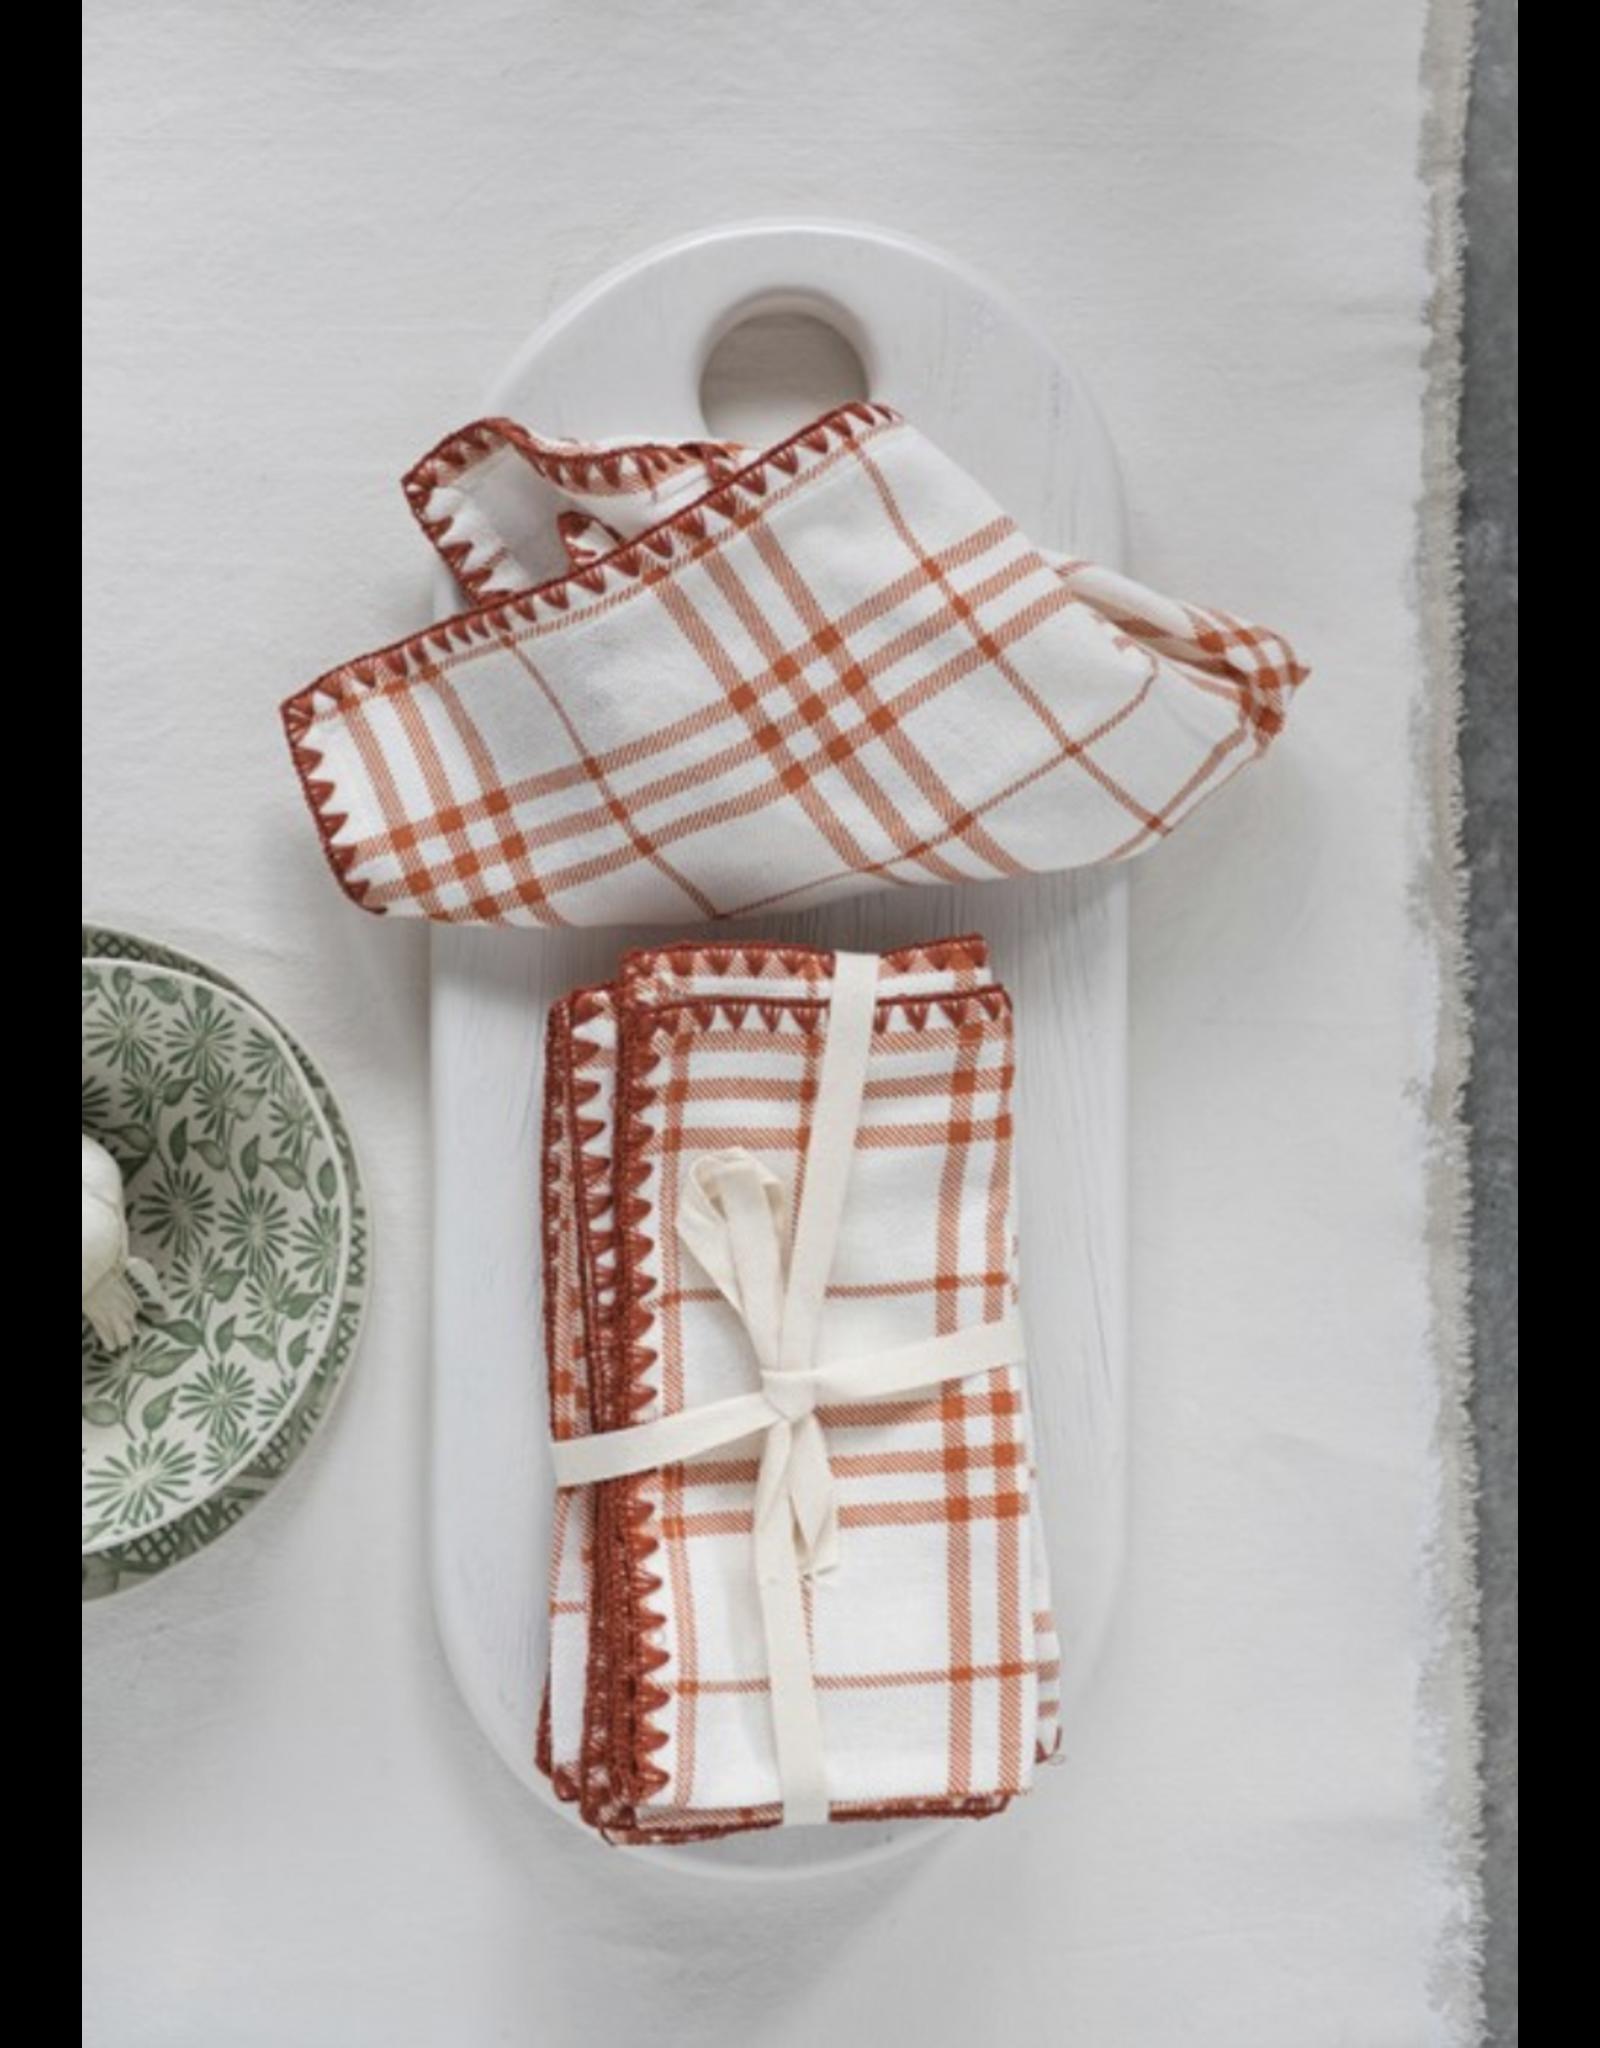 Creative Co-Op Acacia Wood Cheese & Cutting Board White Finish, 19 x 8